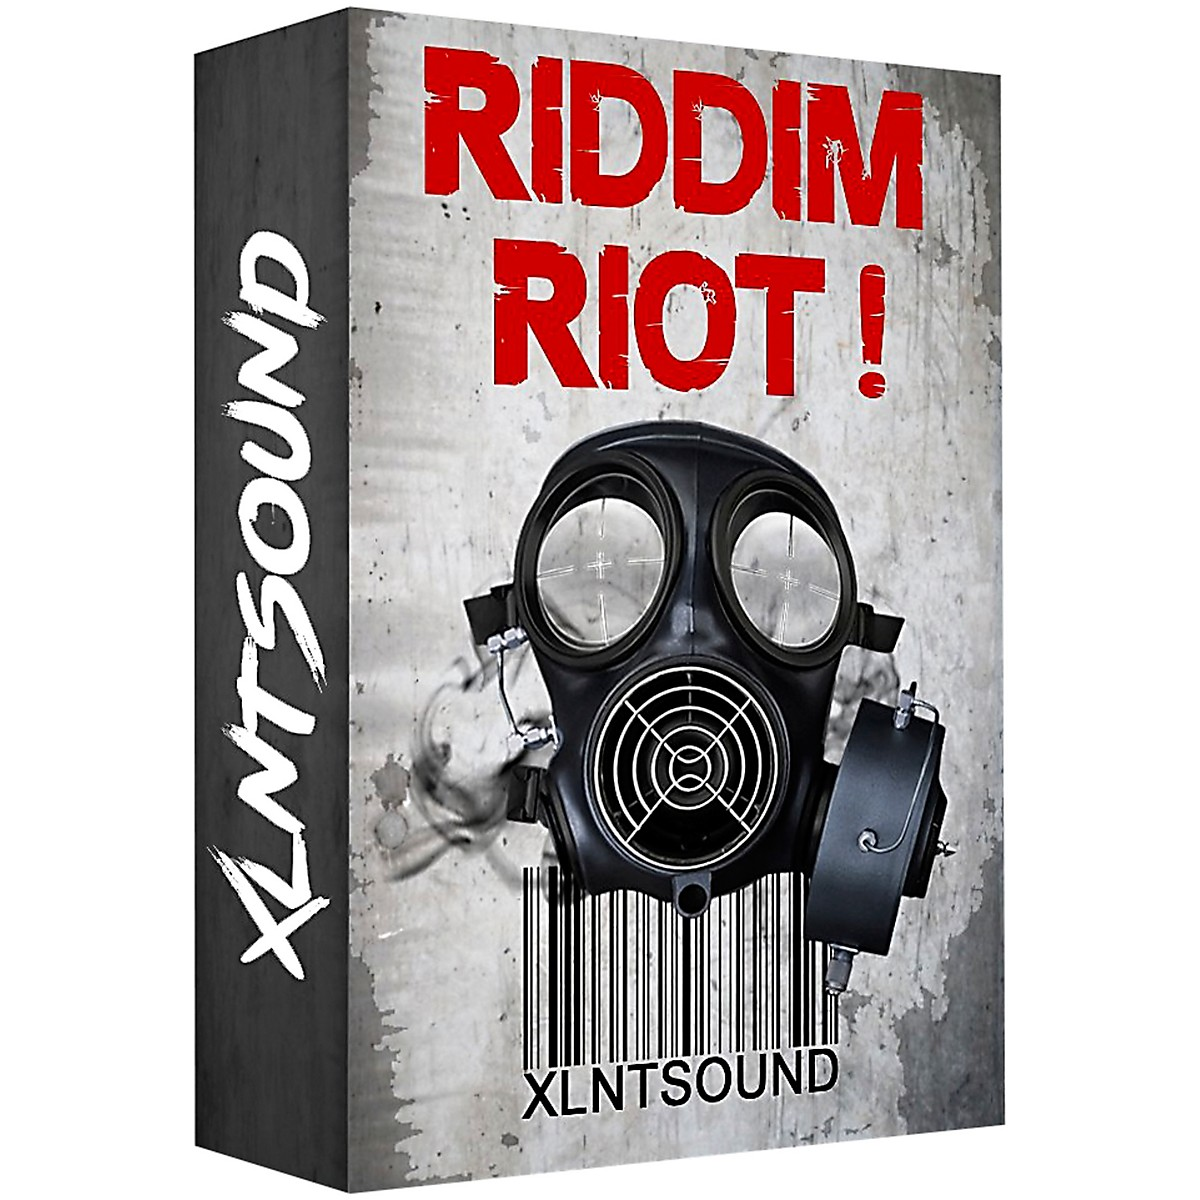 XLNTSOUND RIDDIM RIOT / 255 DUBSTEP DRUM SAMPLES